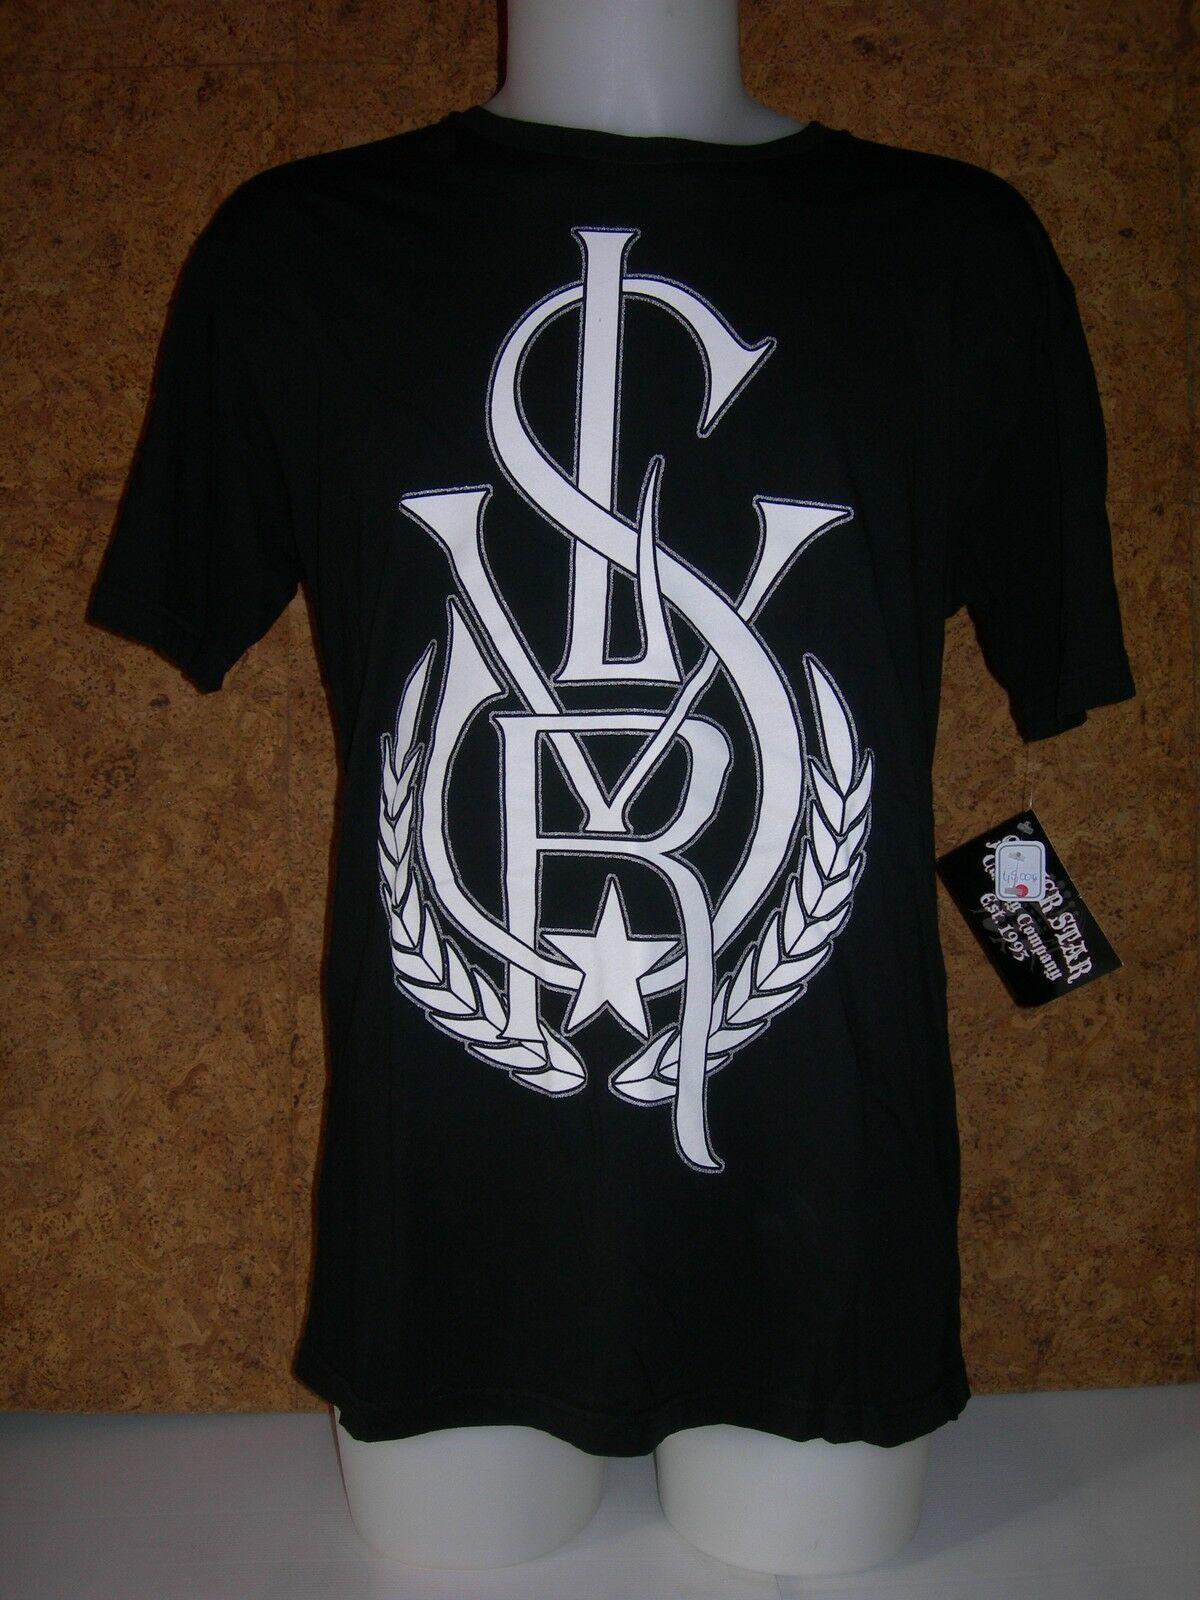 Tee shirt à manches courtes, SILVER STAR, (MTE714) (MTE714) (MTE714) - noir et blanc en L, Neuf 996bfa